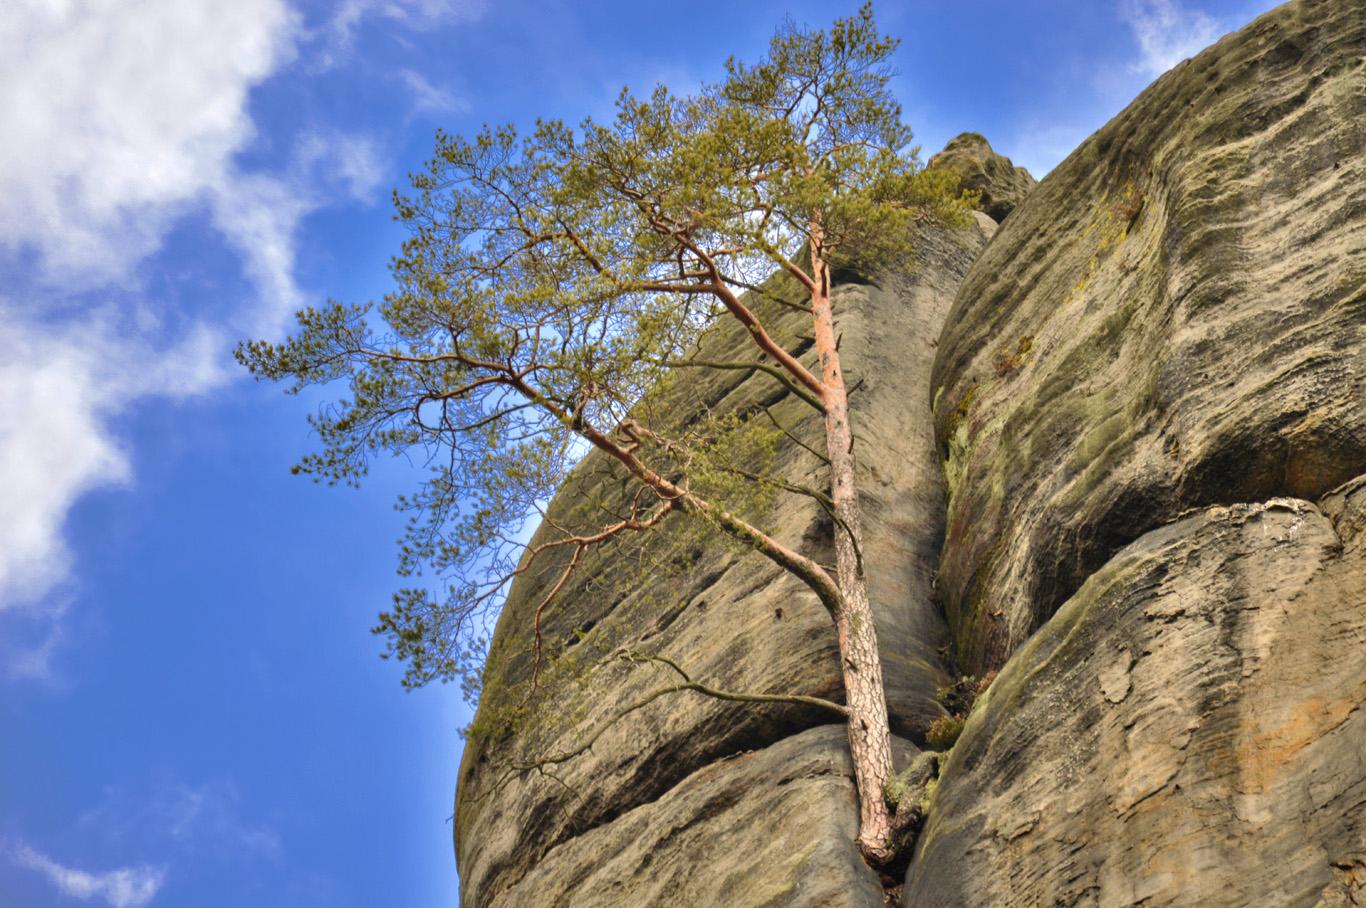 A pine growing in between the rocks